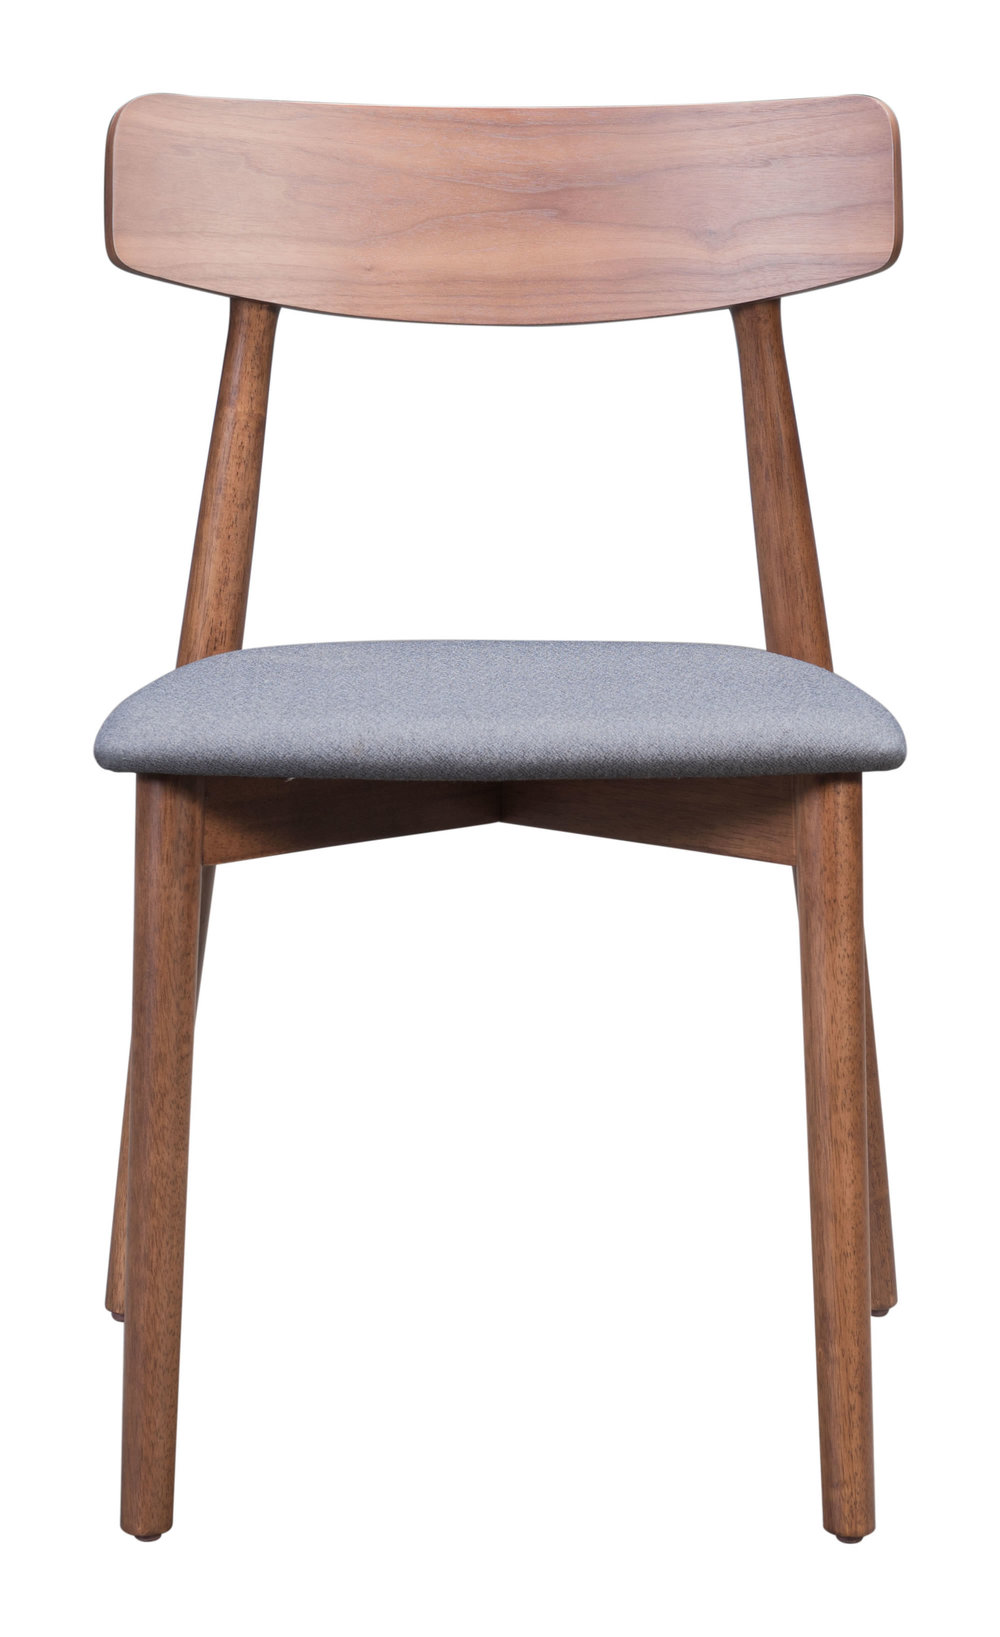 ZUO MODERN CONTEMPORARY, INC - Newman Dining Chair - Set of 2 - Walnut & Gray